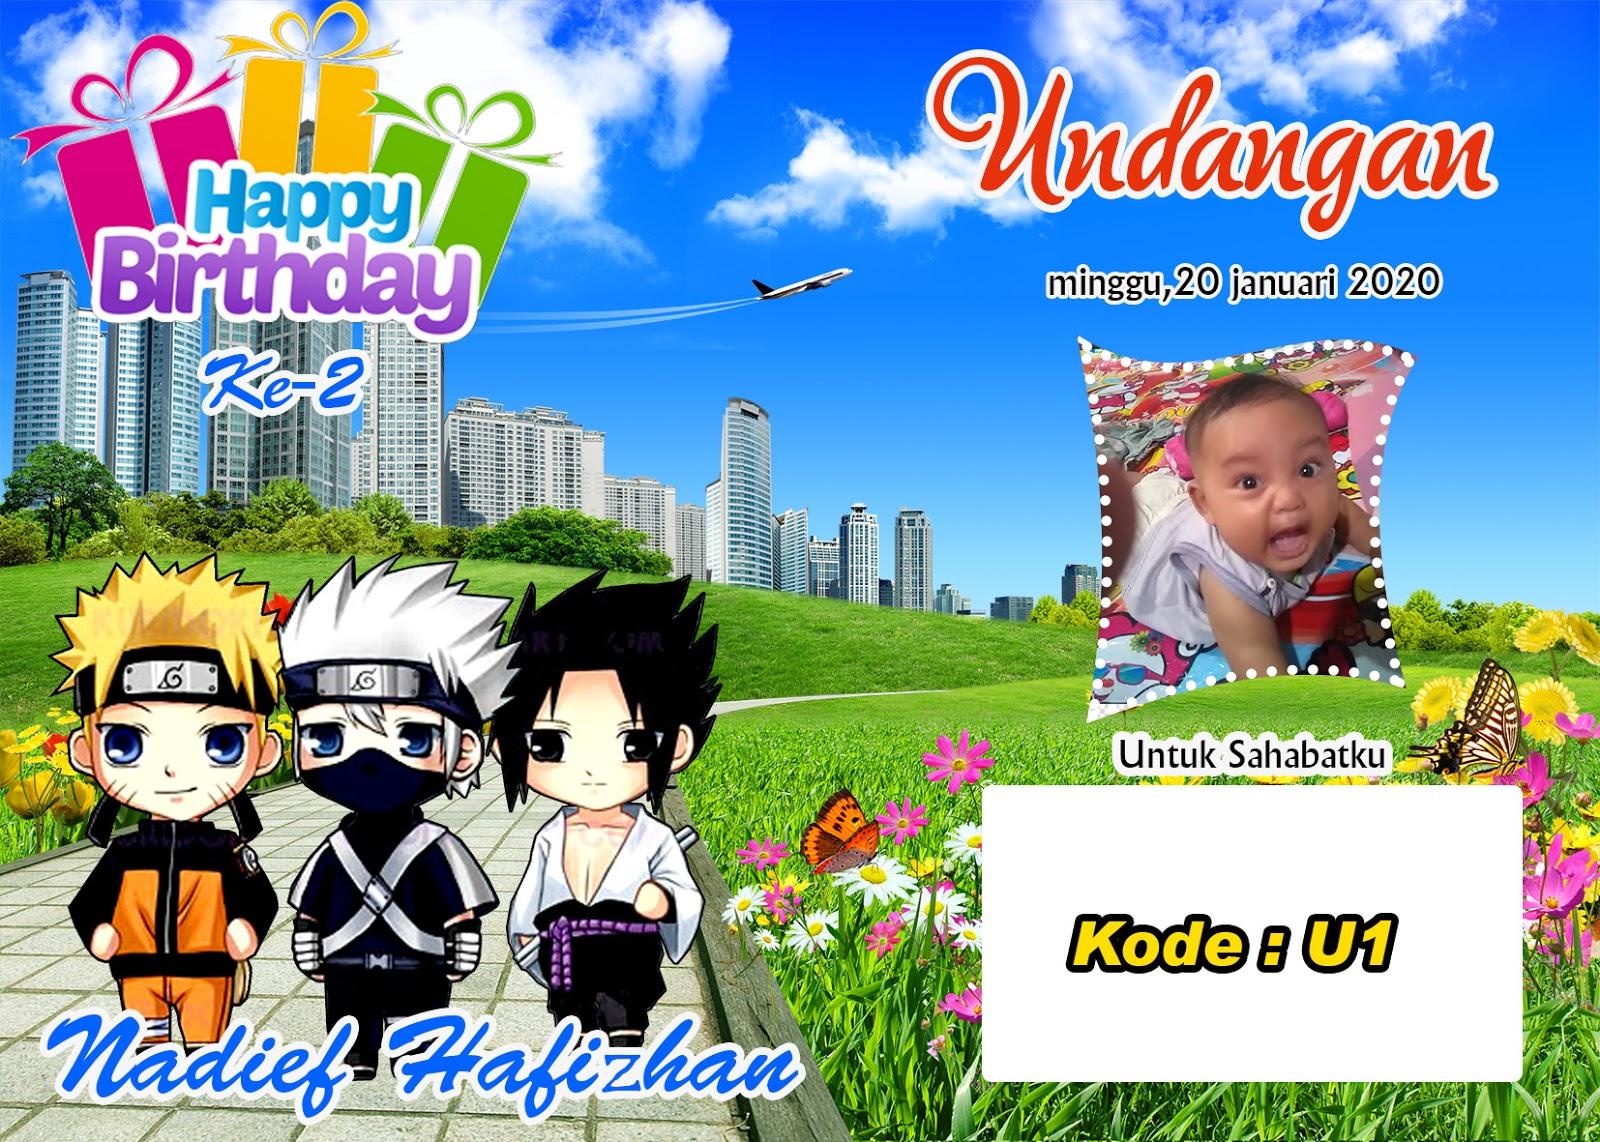 Undangan Ulang Tahun Anak Joninot Info